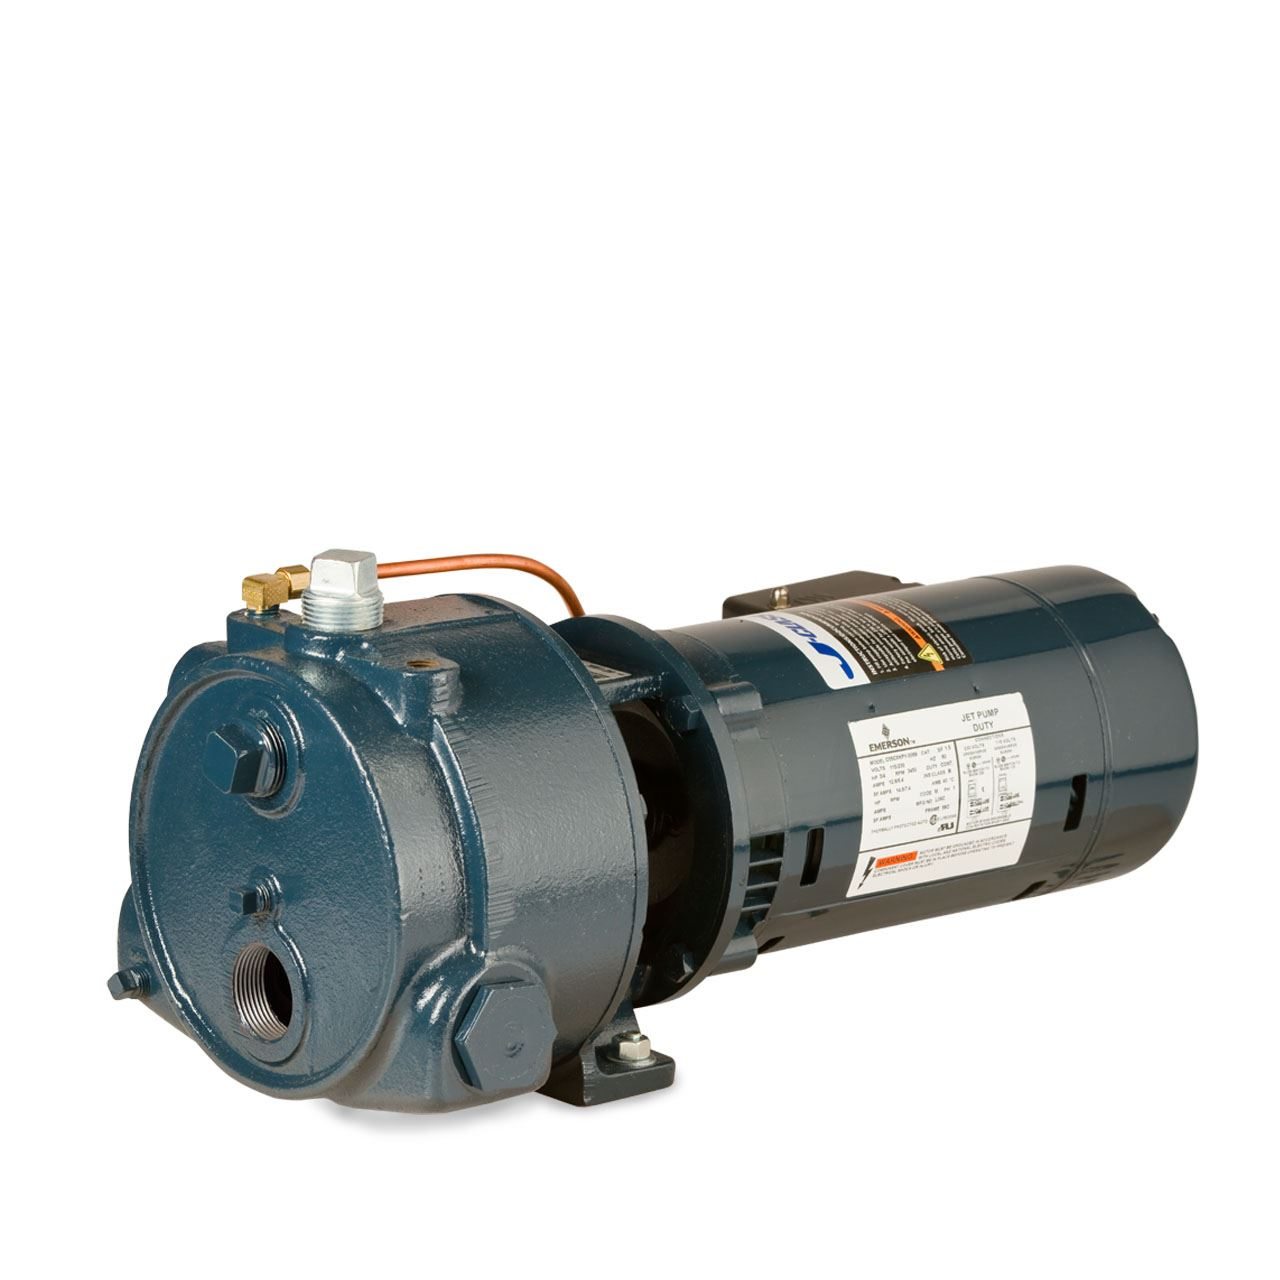 franklin electric franklin electric jrm07ci c 91110882 rm2 series single phase 115v motor diagrams 115 230 [ 1280 x 1280 Pixel ]